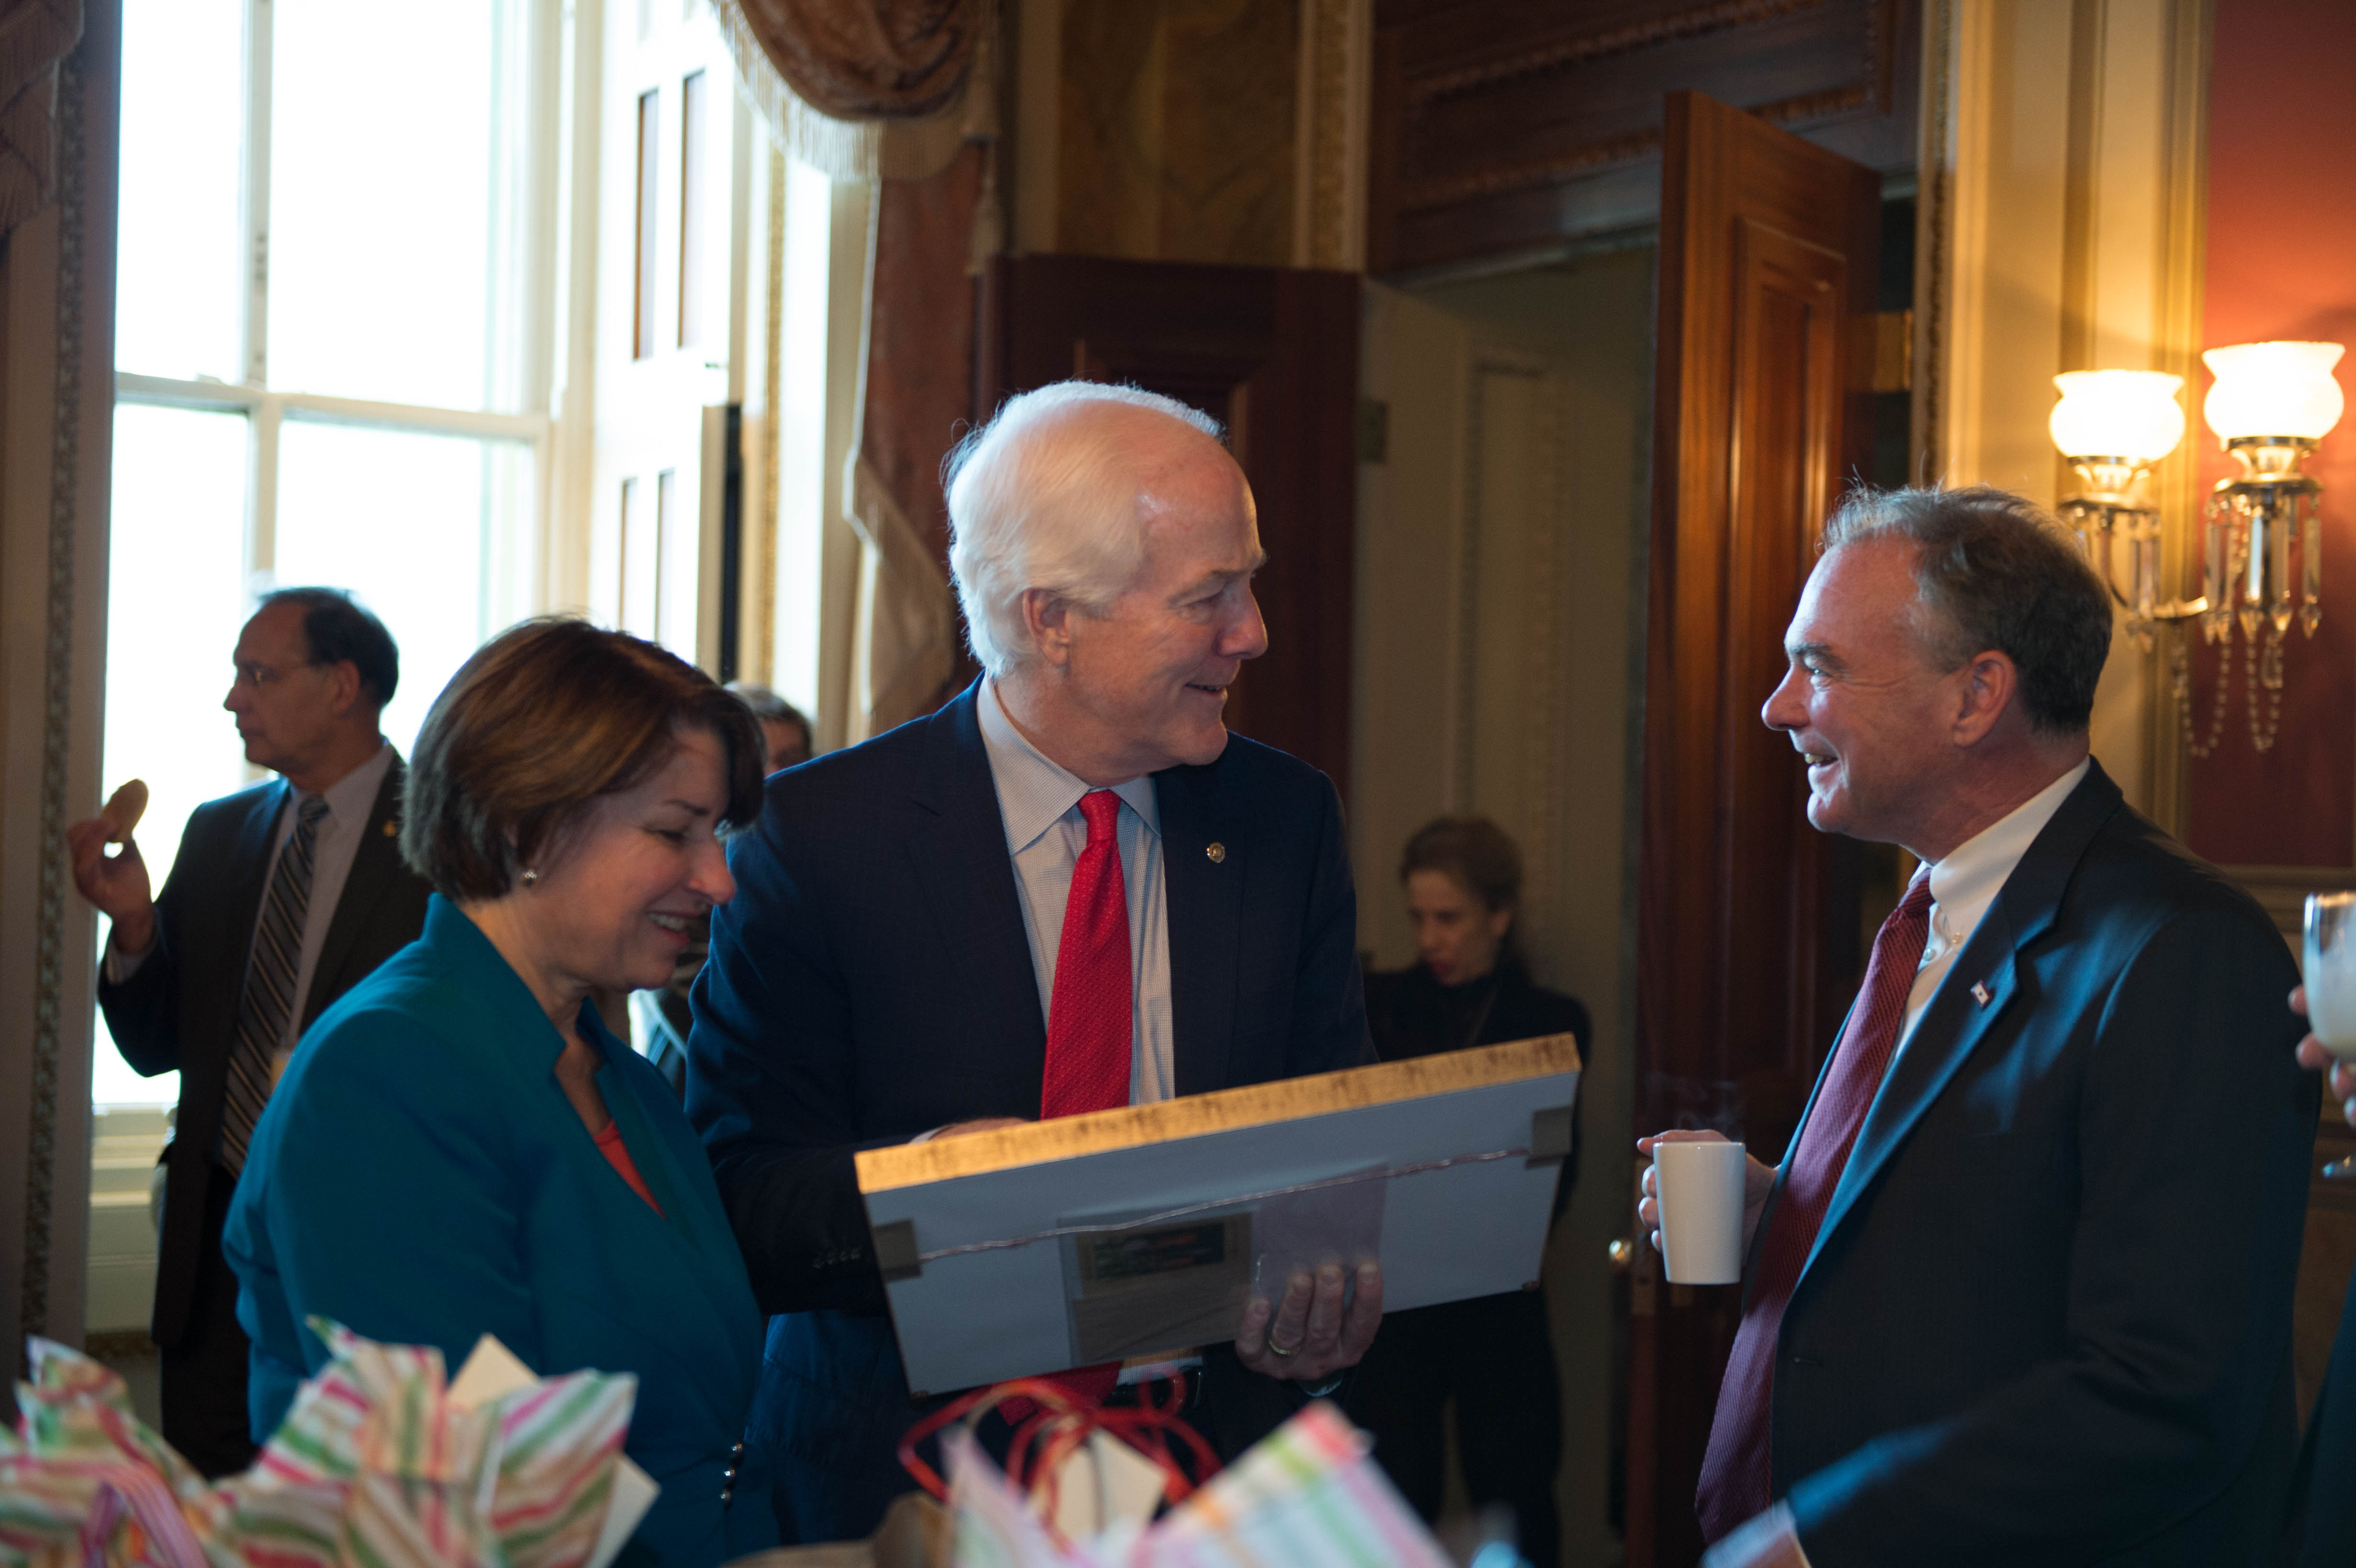 From left to right: Sen. Amy Klobuchar, D-Minn., Sen. John Cornyn, R-Texas, Sen. Tim Kaine, D-Va., at the holiday gift exchange. (Photo courtesy of Senate Democrats)